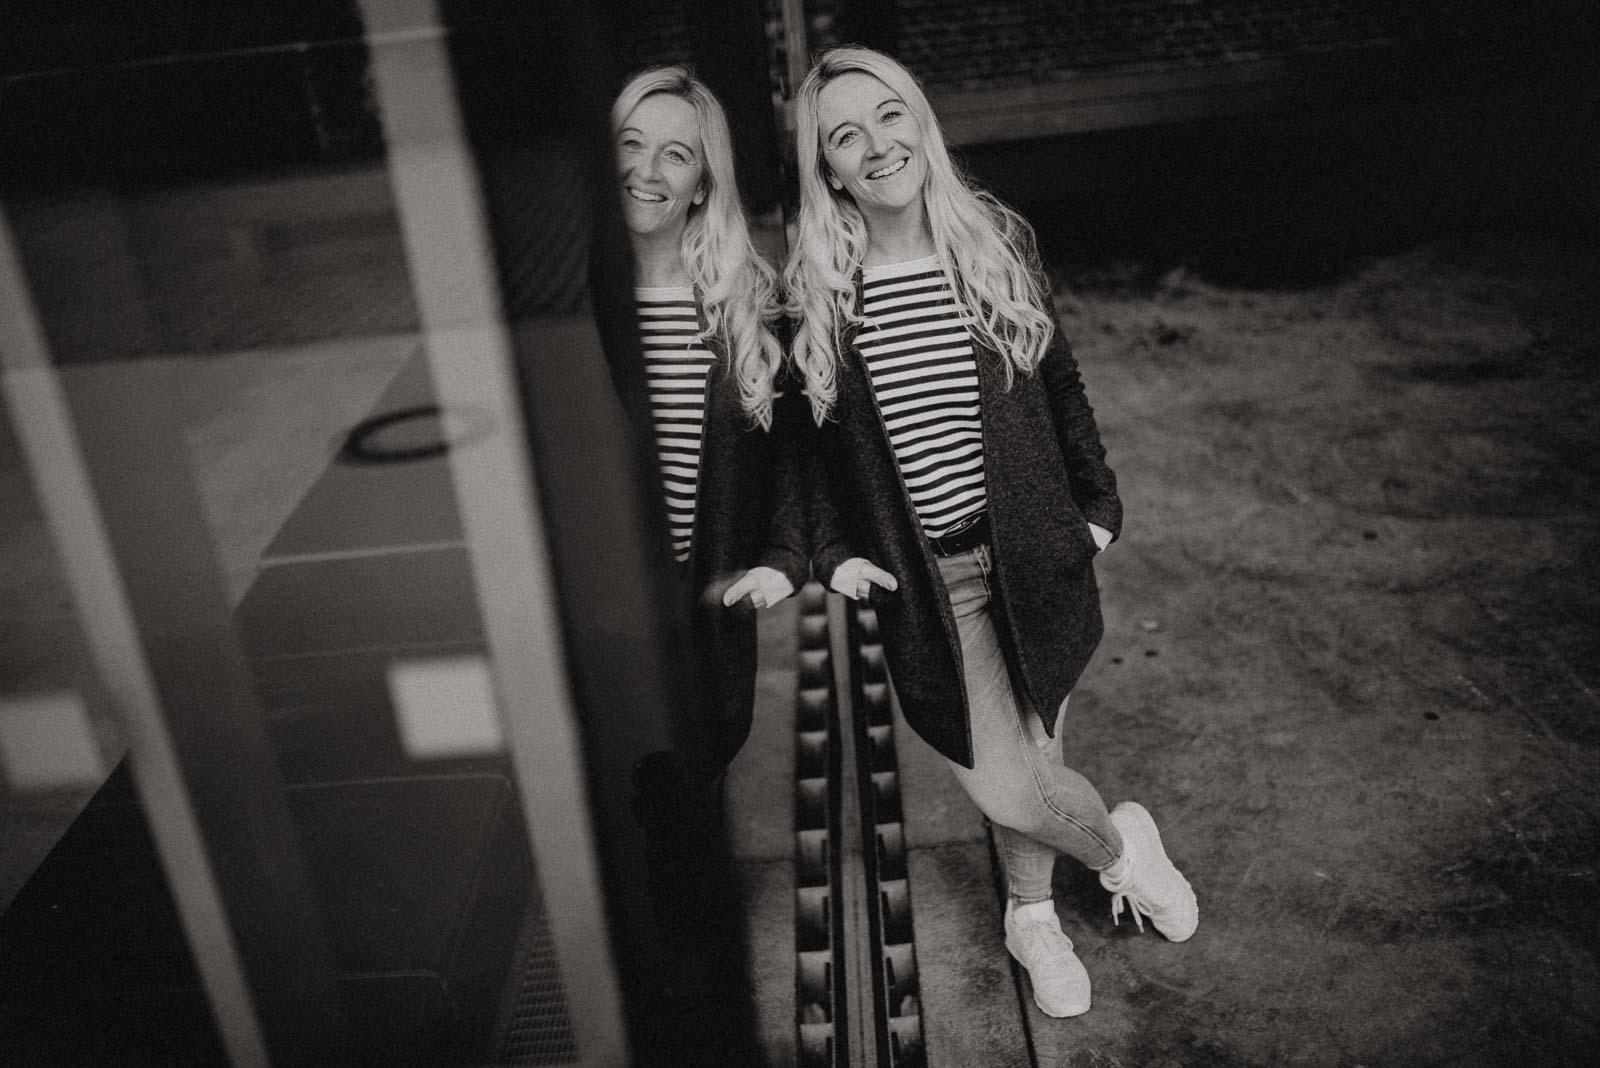 001-fotograf-witten-bochum-businessshooting-urban